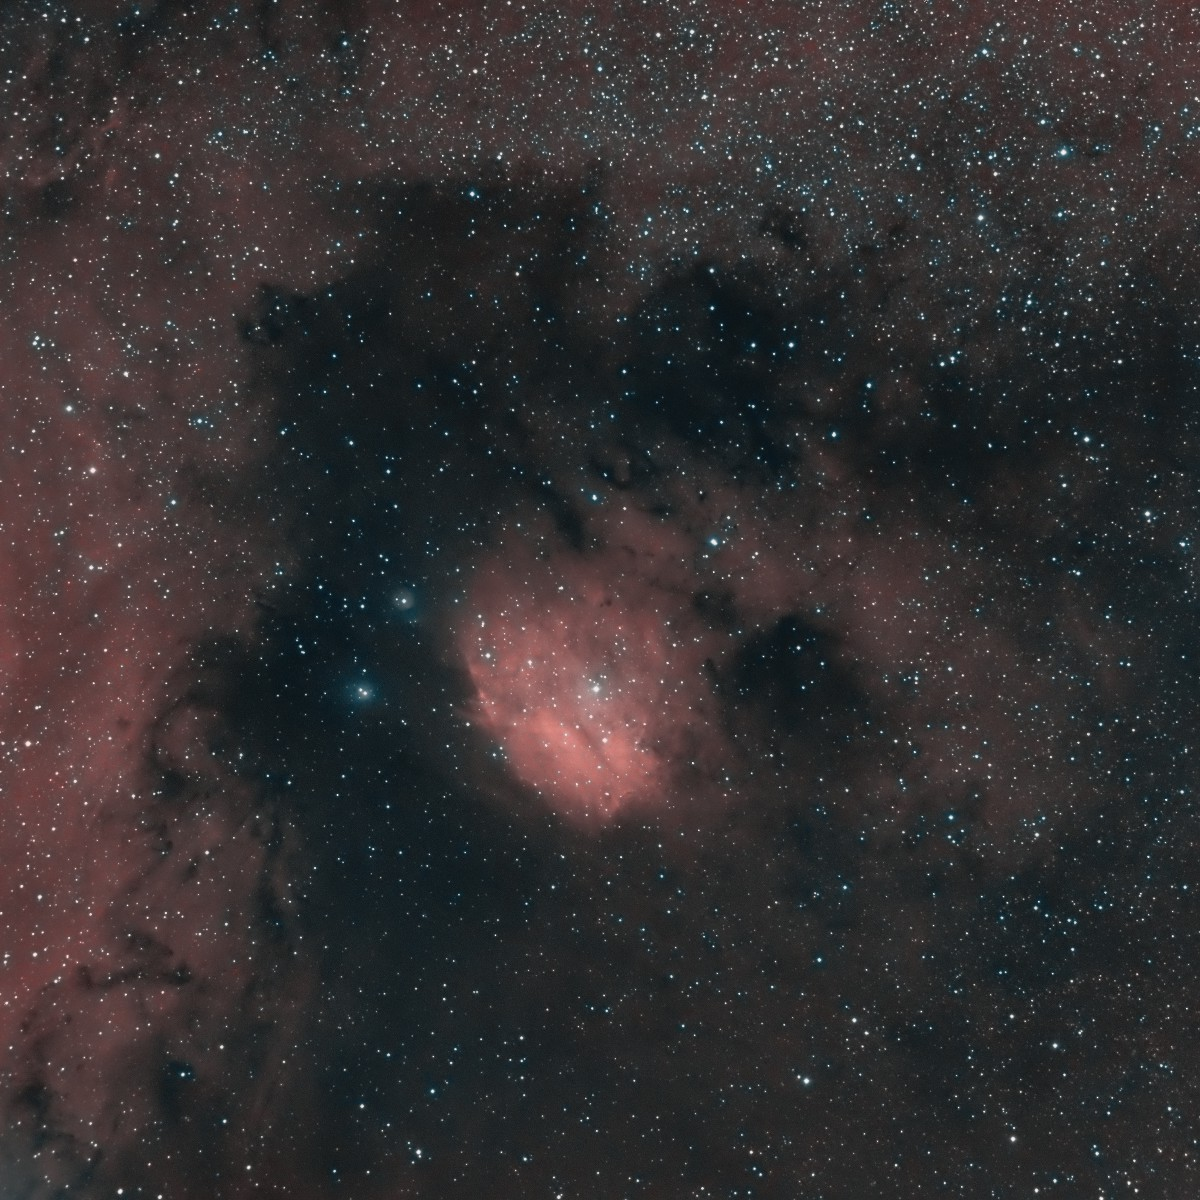 La nébuleuse IC1283